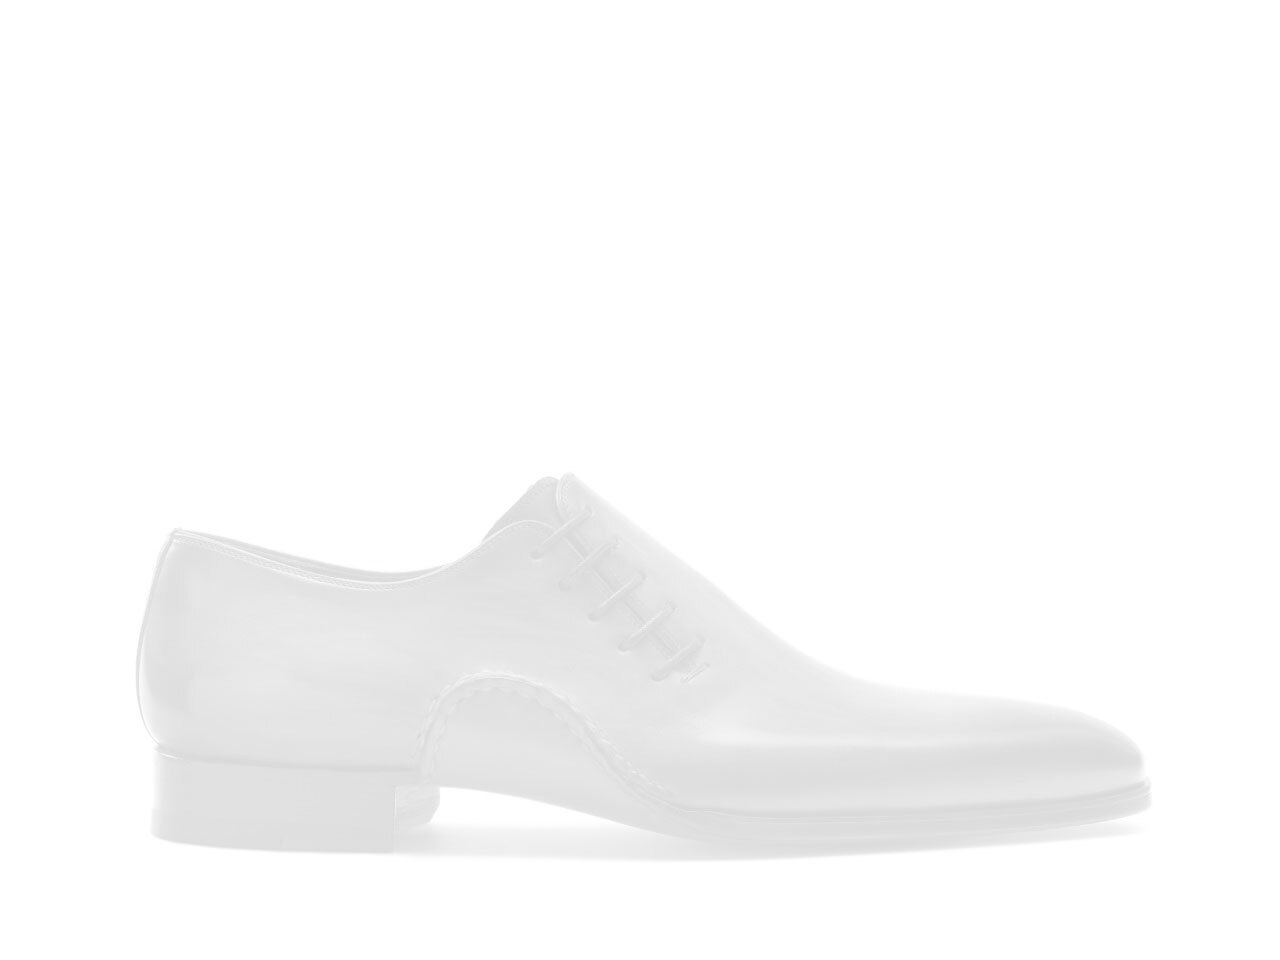 Sole of the Magnanni Jethro Cuero Men's Oxford Shoes